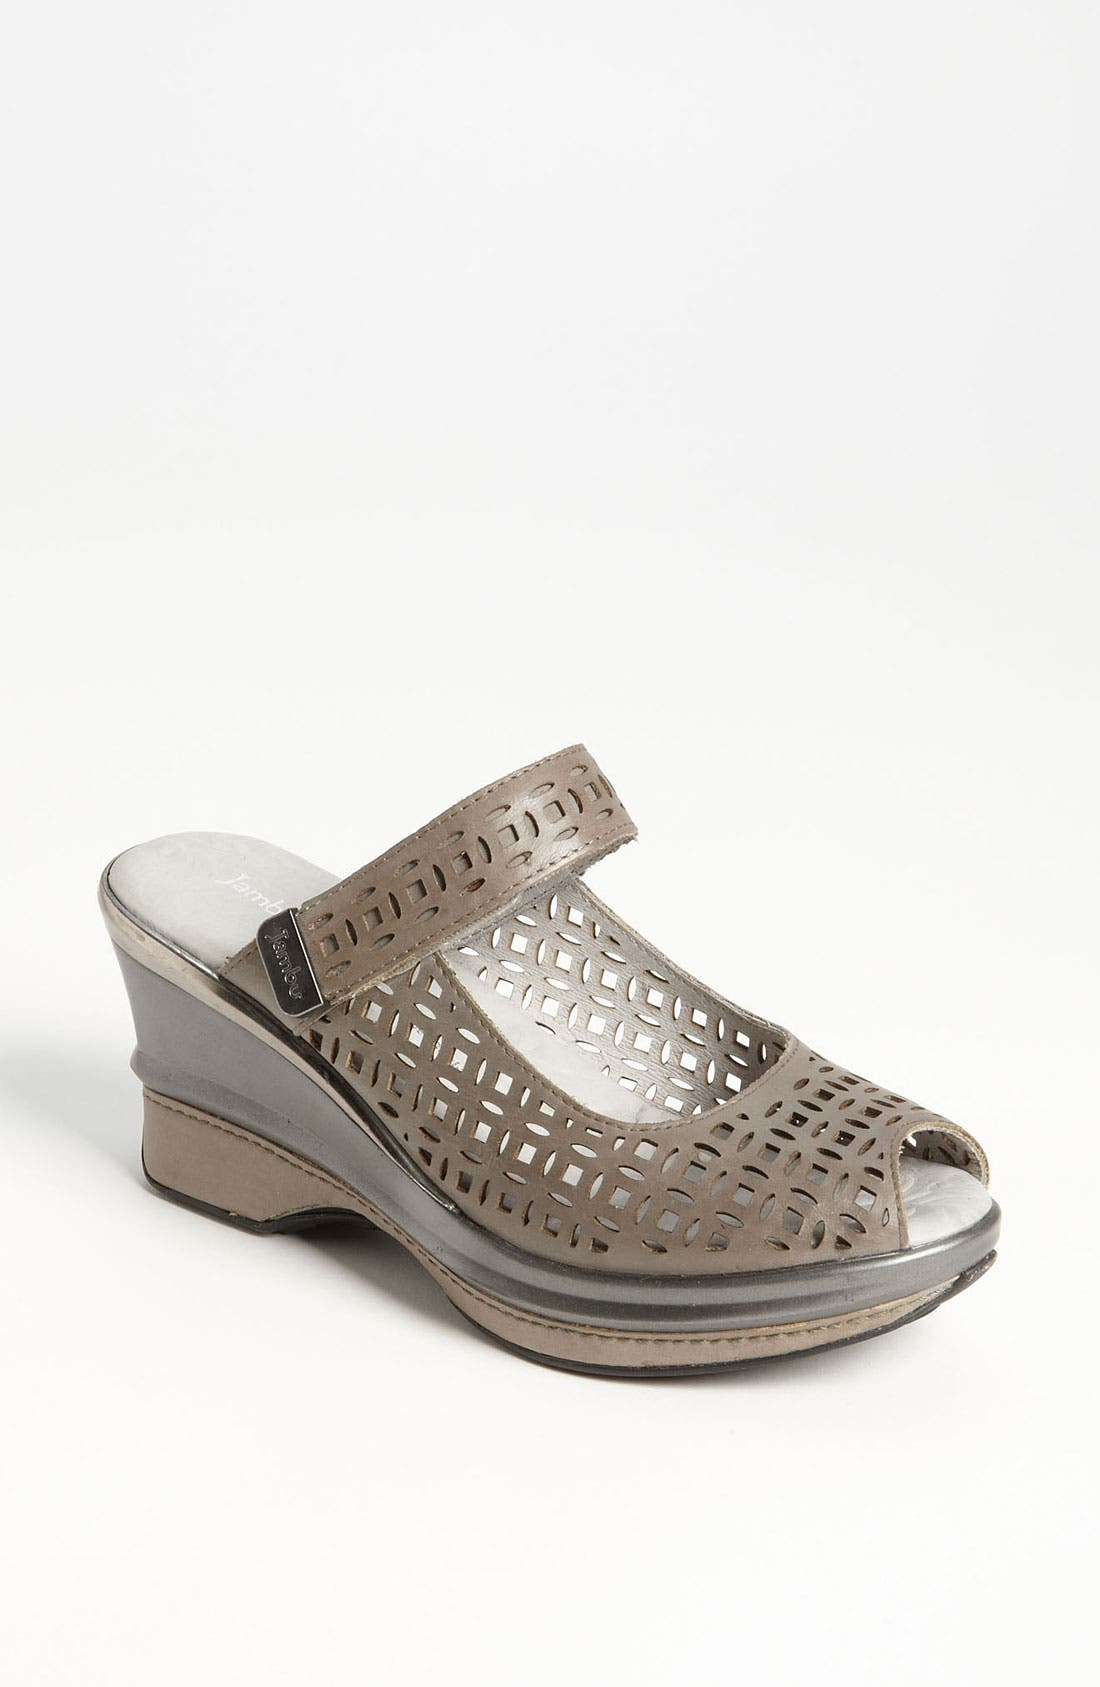 Alternate Image 1 Selected - Jambu 'Orion' Sandal